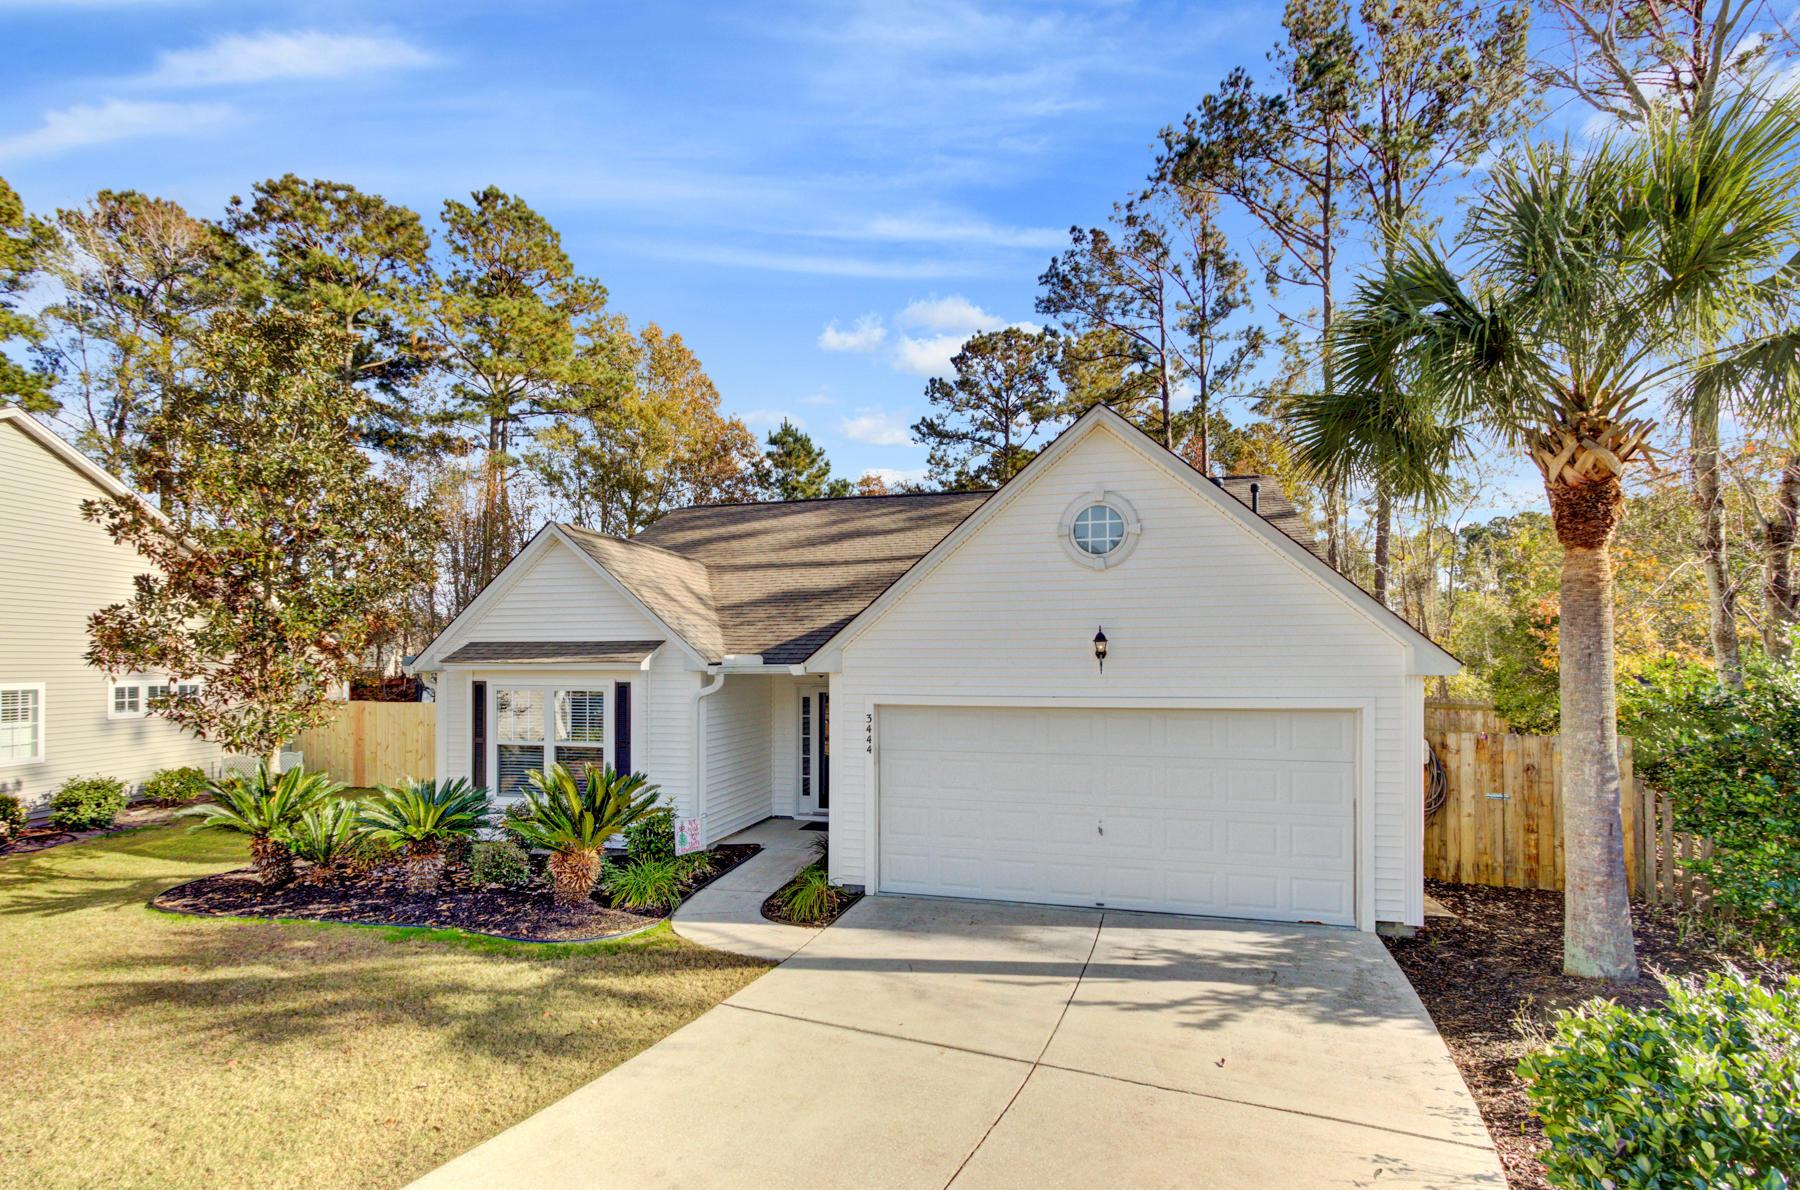 Park West Homes For Sale - 3444 Wellesley, Mount Pleasant, SC - 25